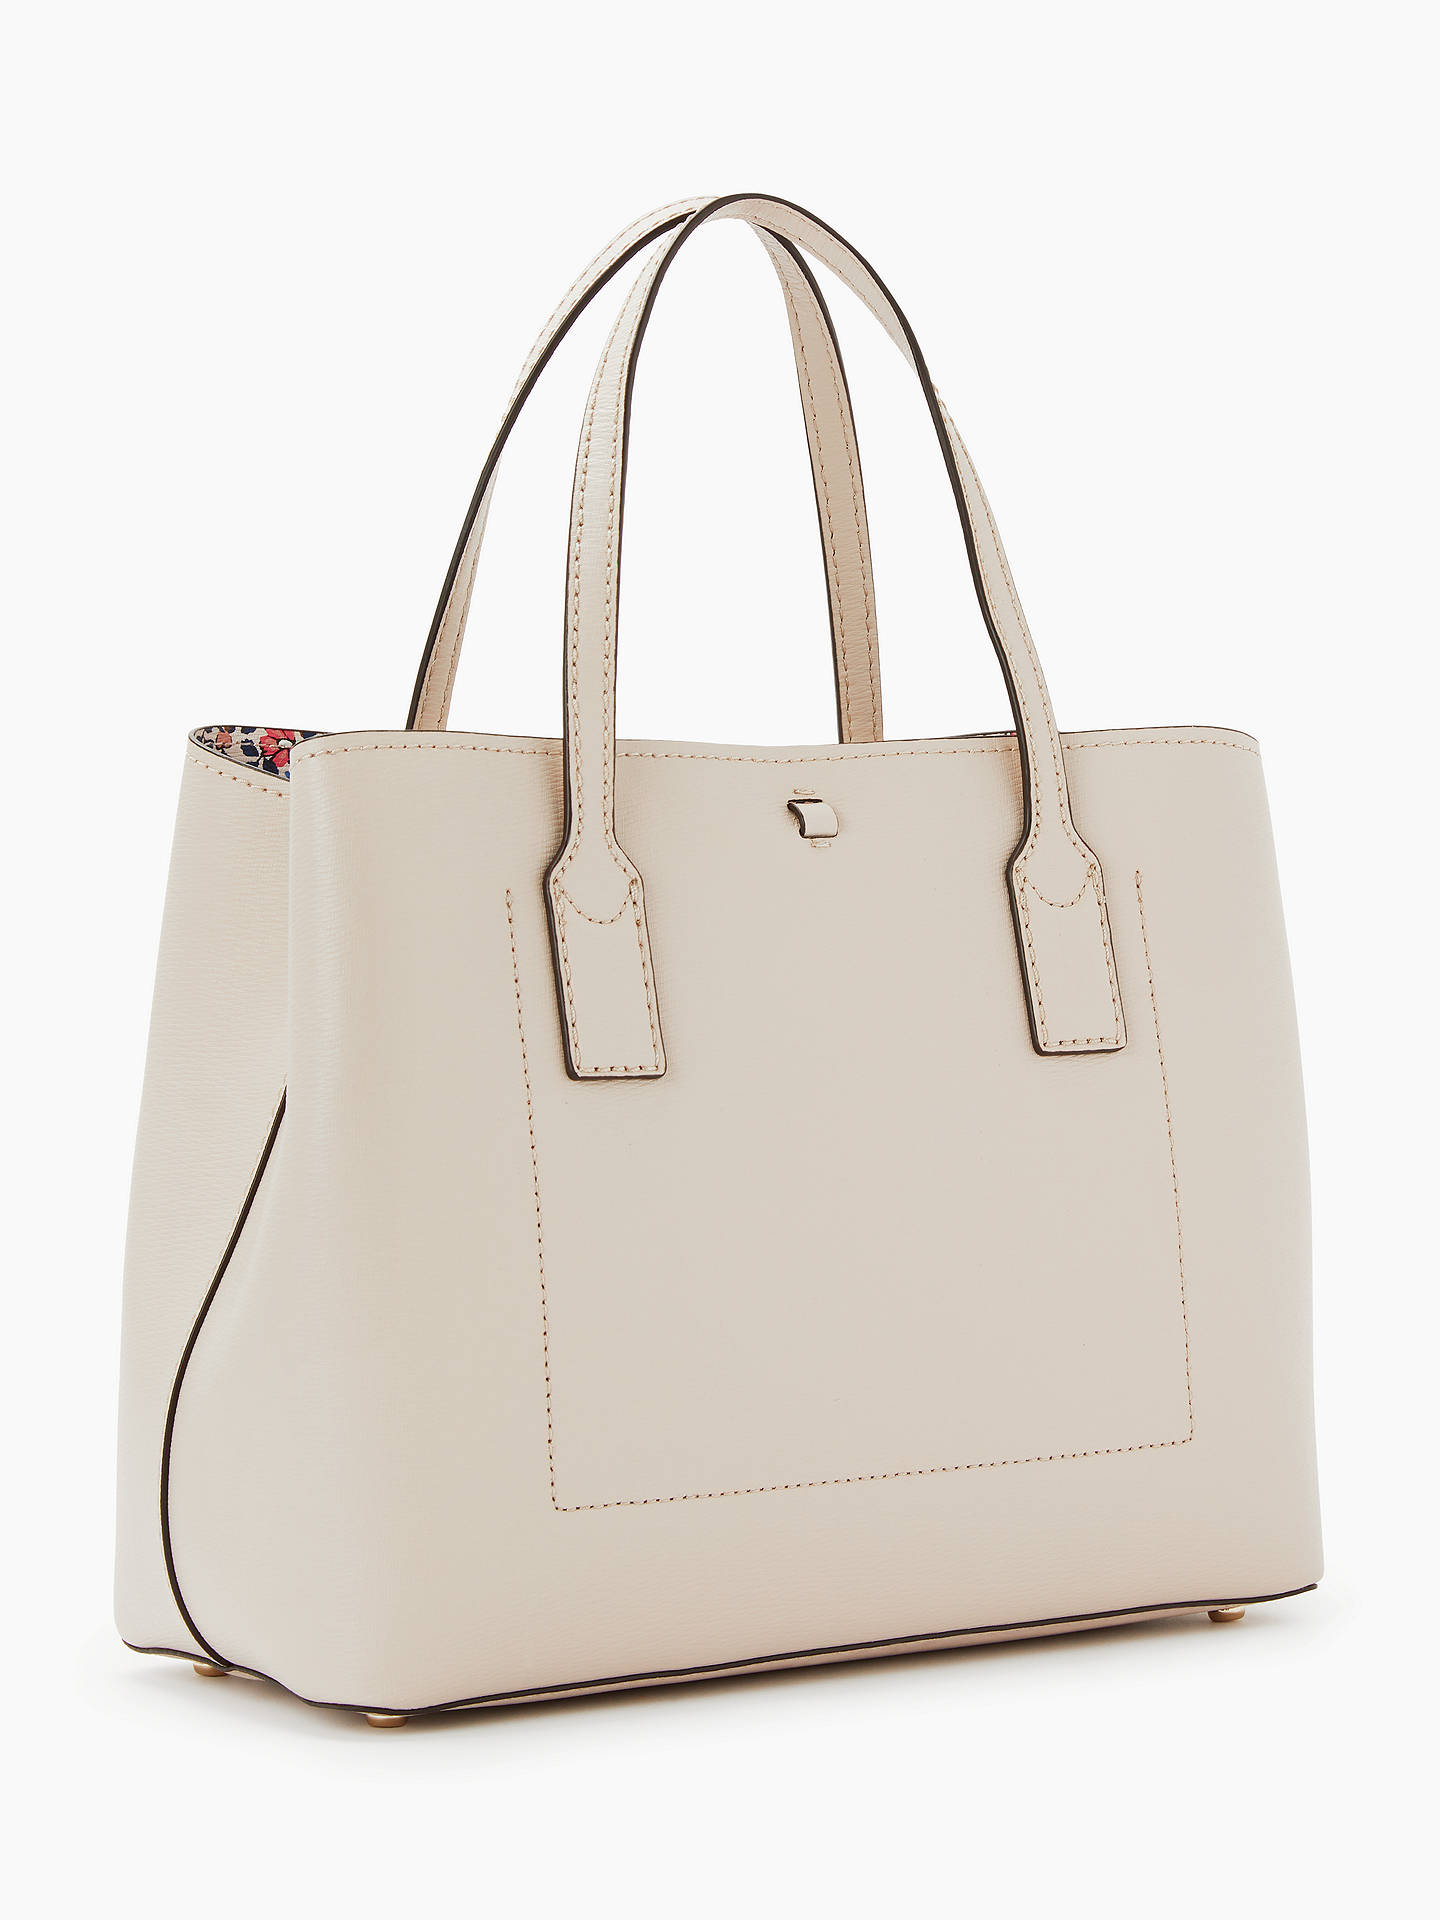 c5f8ad8da426 ... Buy kate spade new york Hadley Road Dina Small Leather Handbag